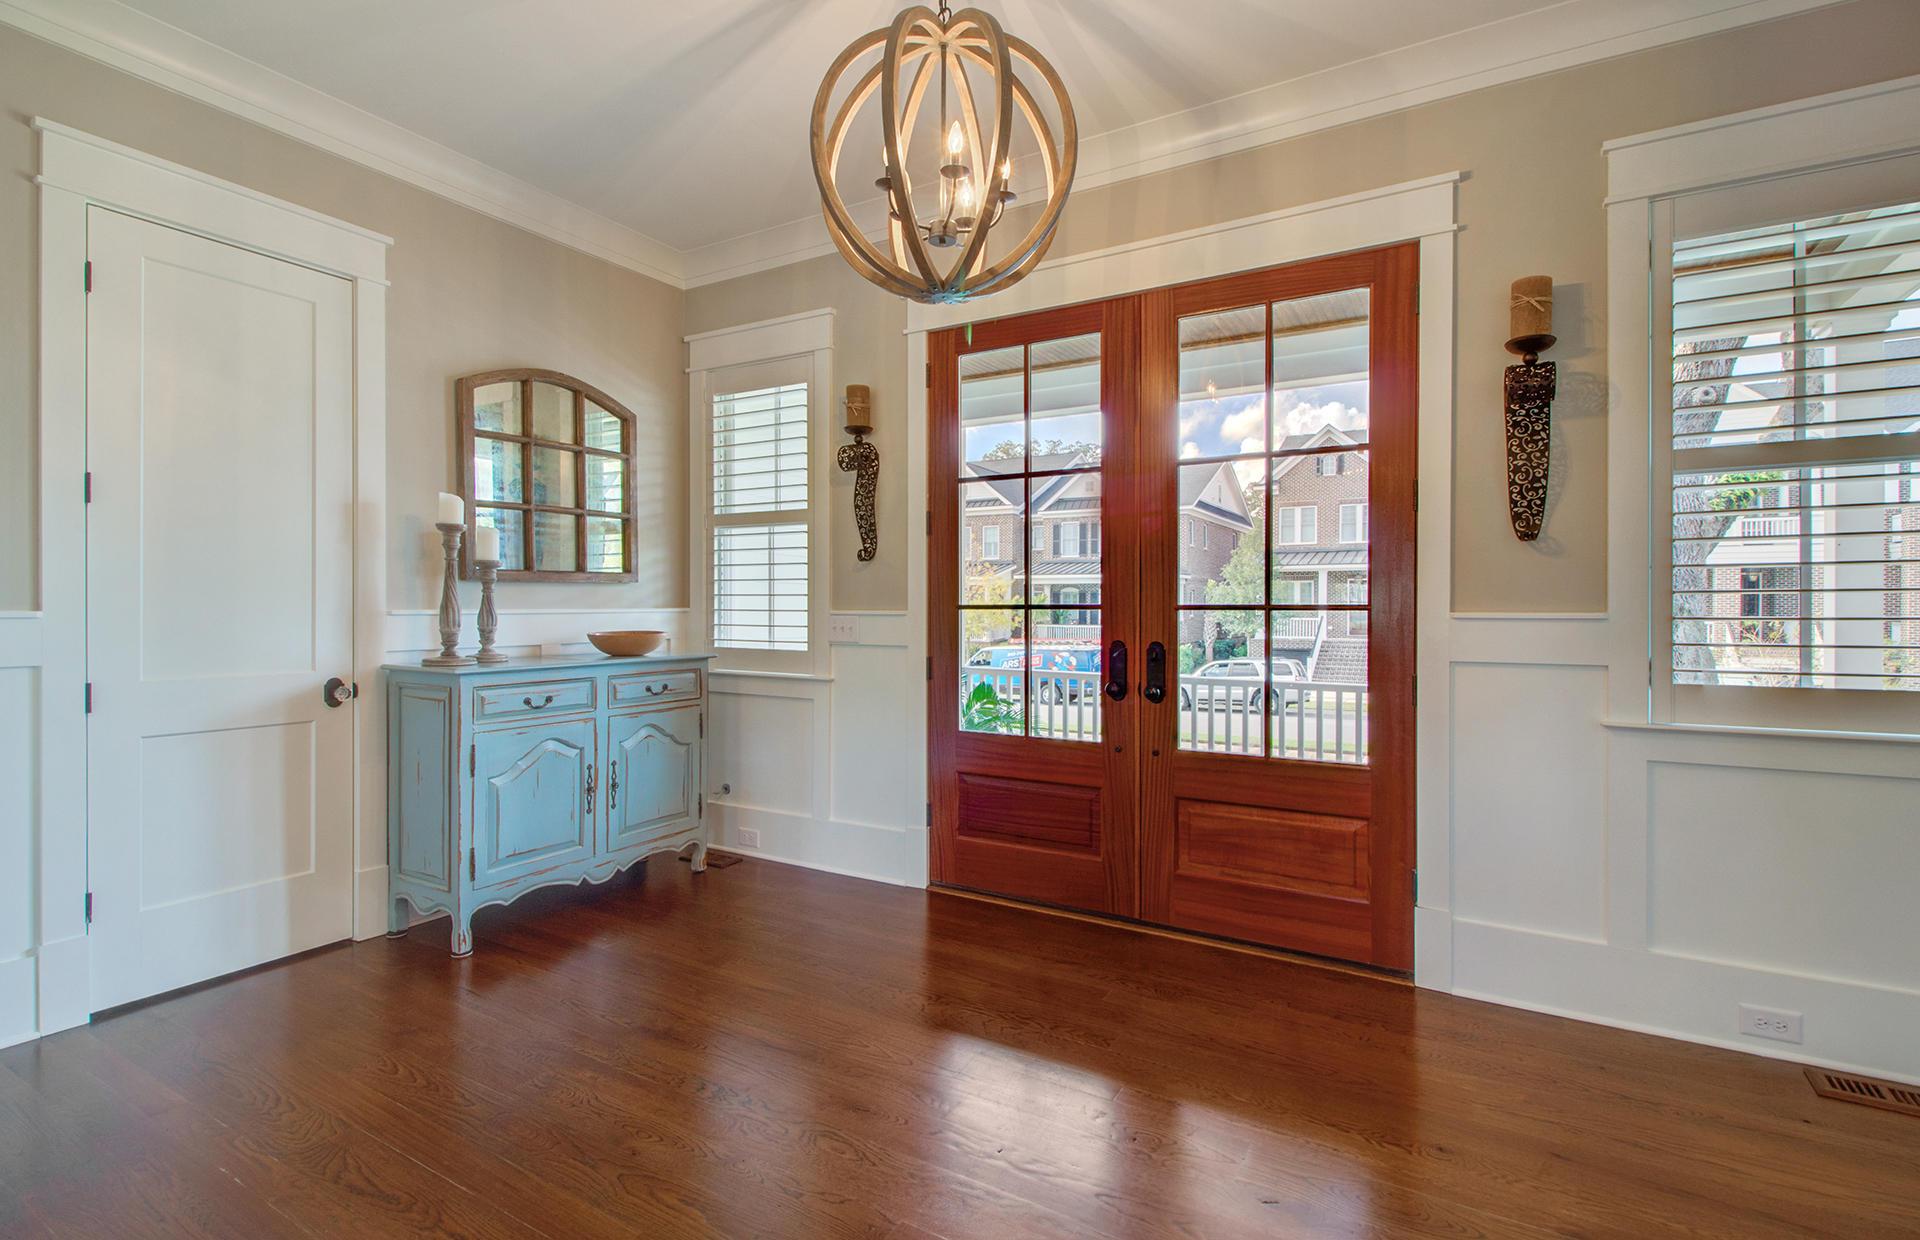 Daniel Island Park Homes For Sale - 117 Brailsford, Charleston, SC - 17